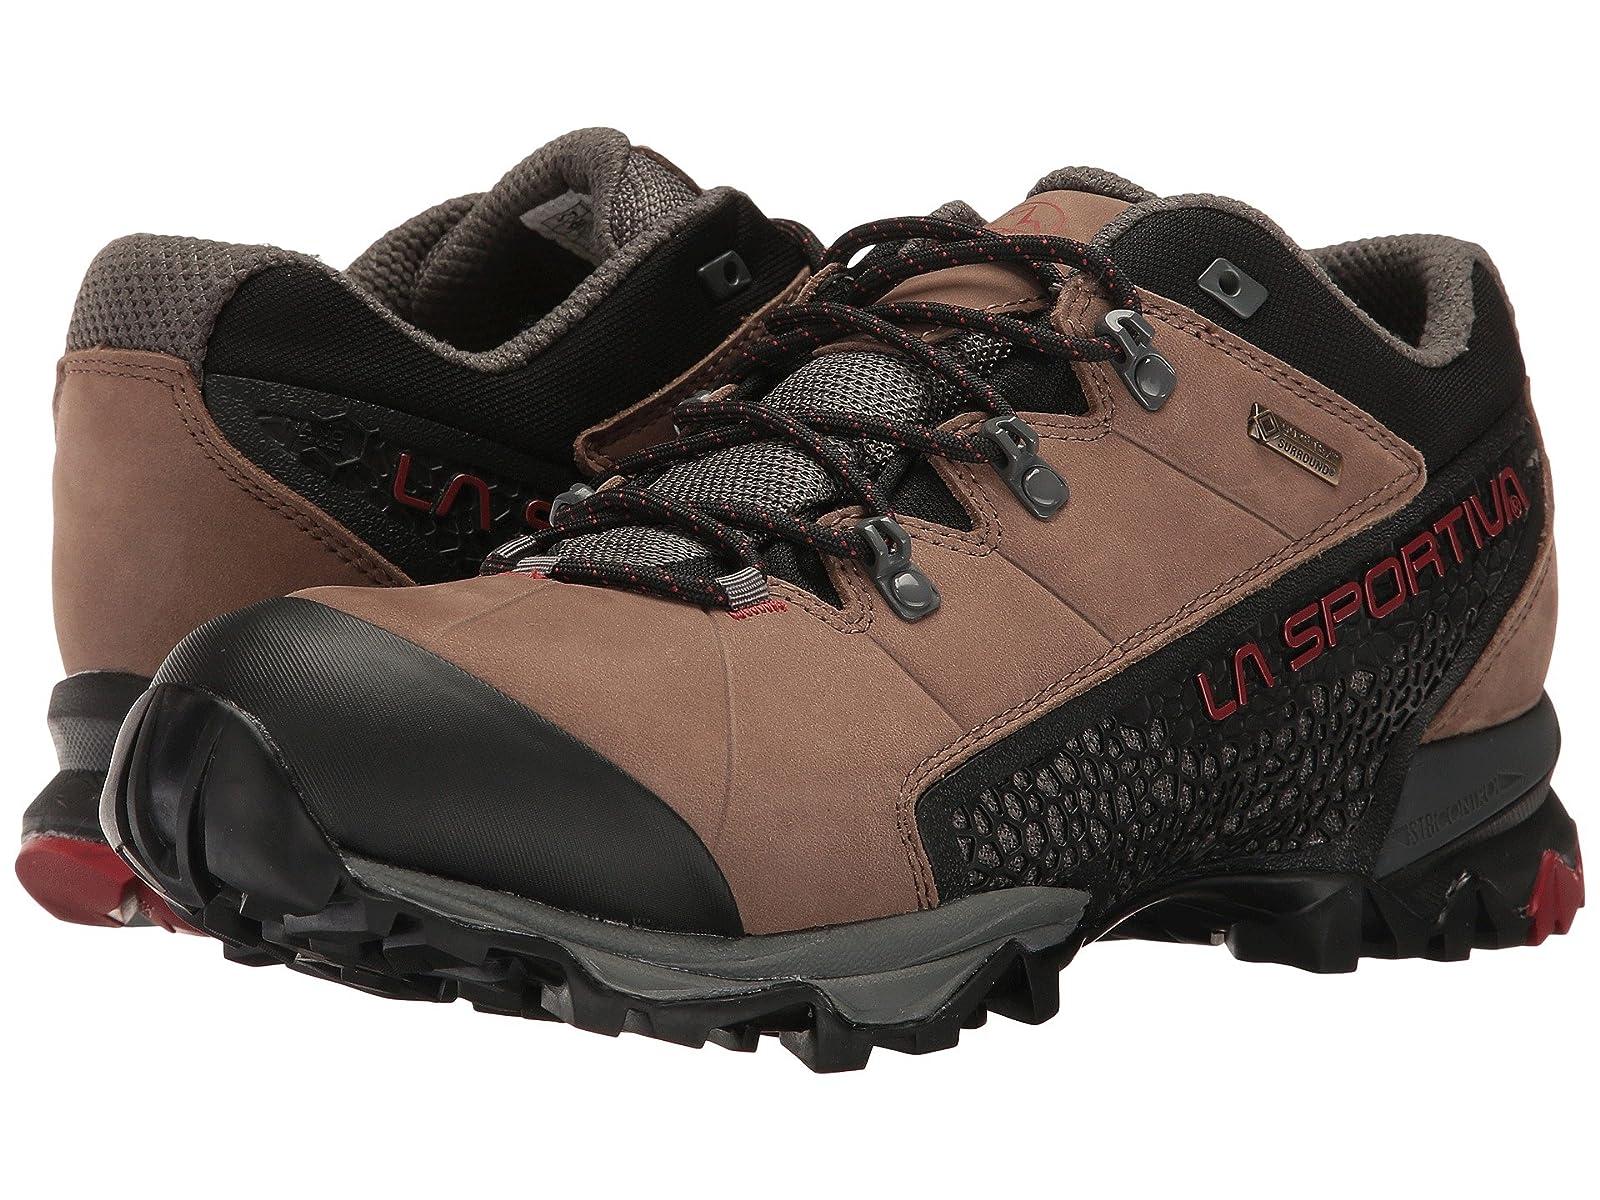 La Sportiva Genesis Low GTXAtmospheric grades have affordable shoes